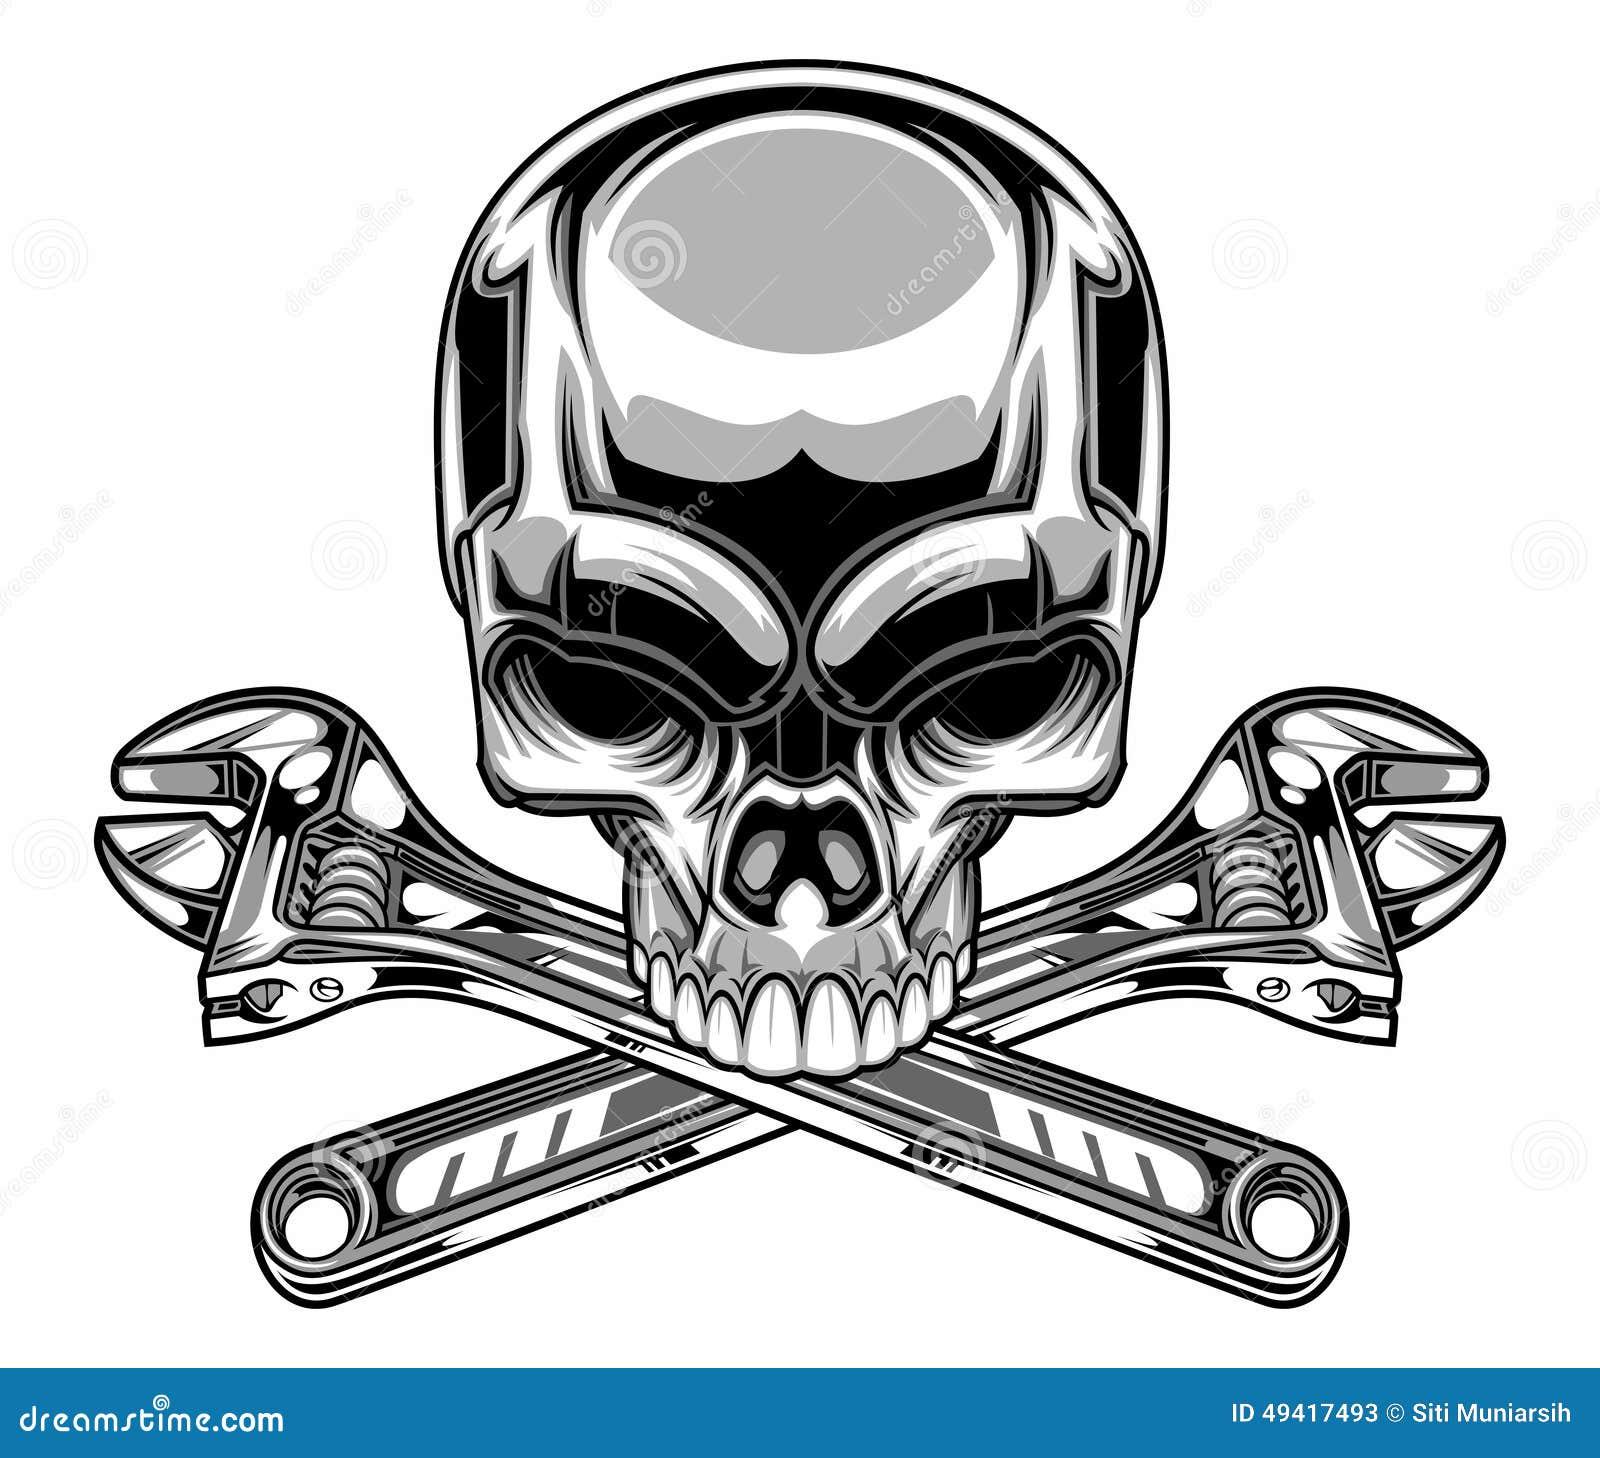 Metallic Skull Stock Illustration - Image: 49417493